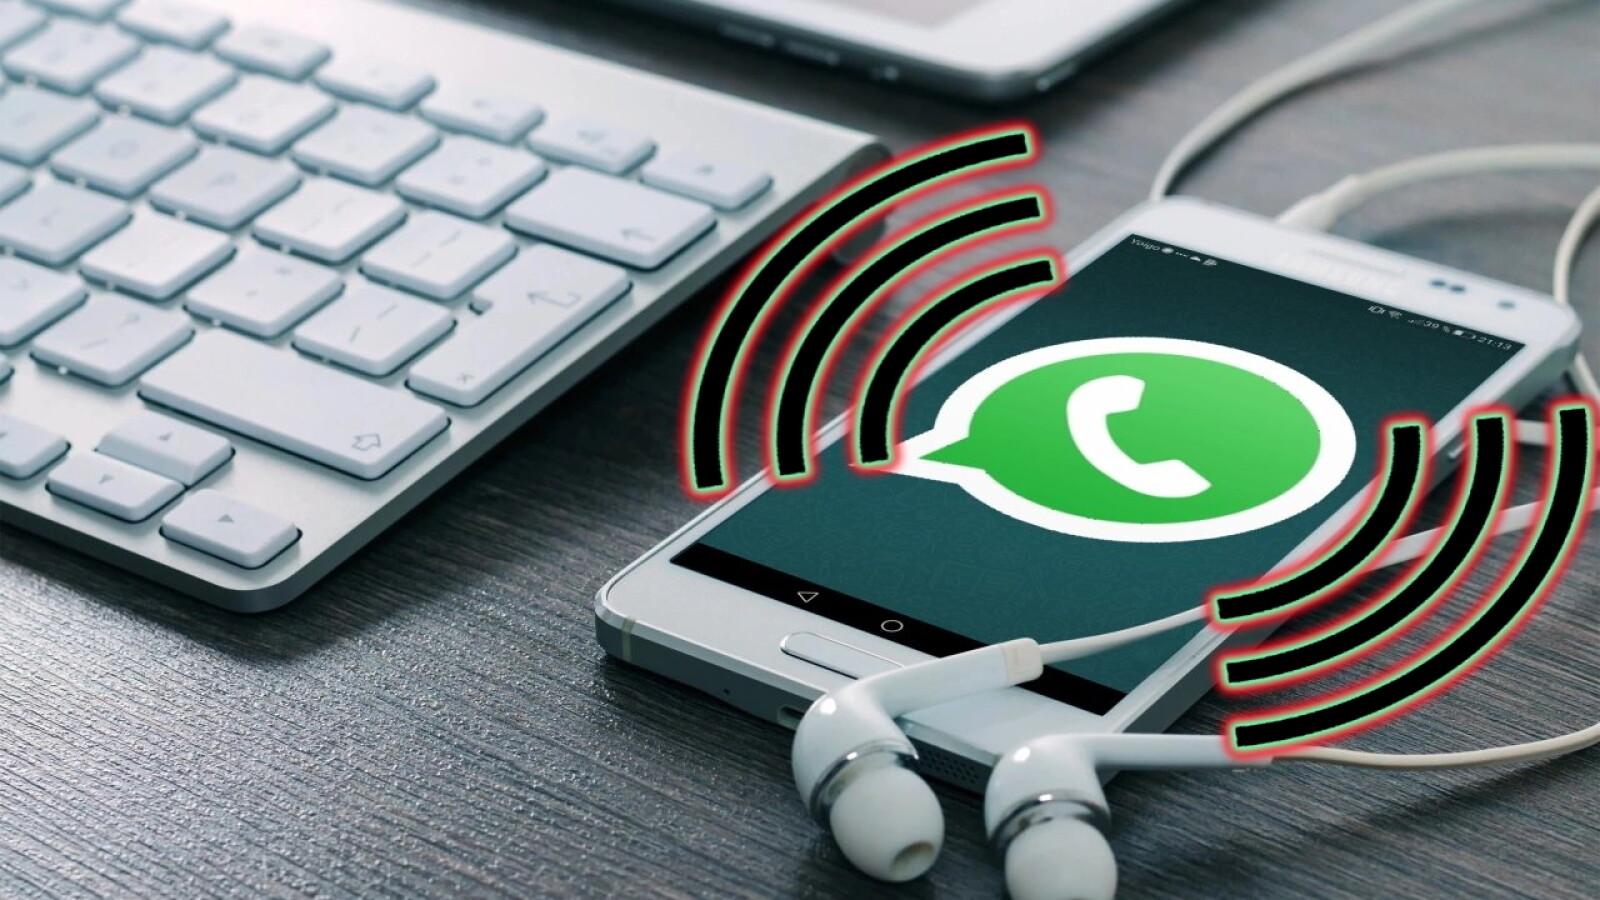 Wie Bekomme Ich Neue Smileys In Whatsapp